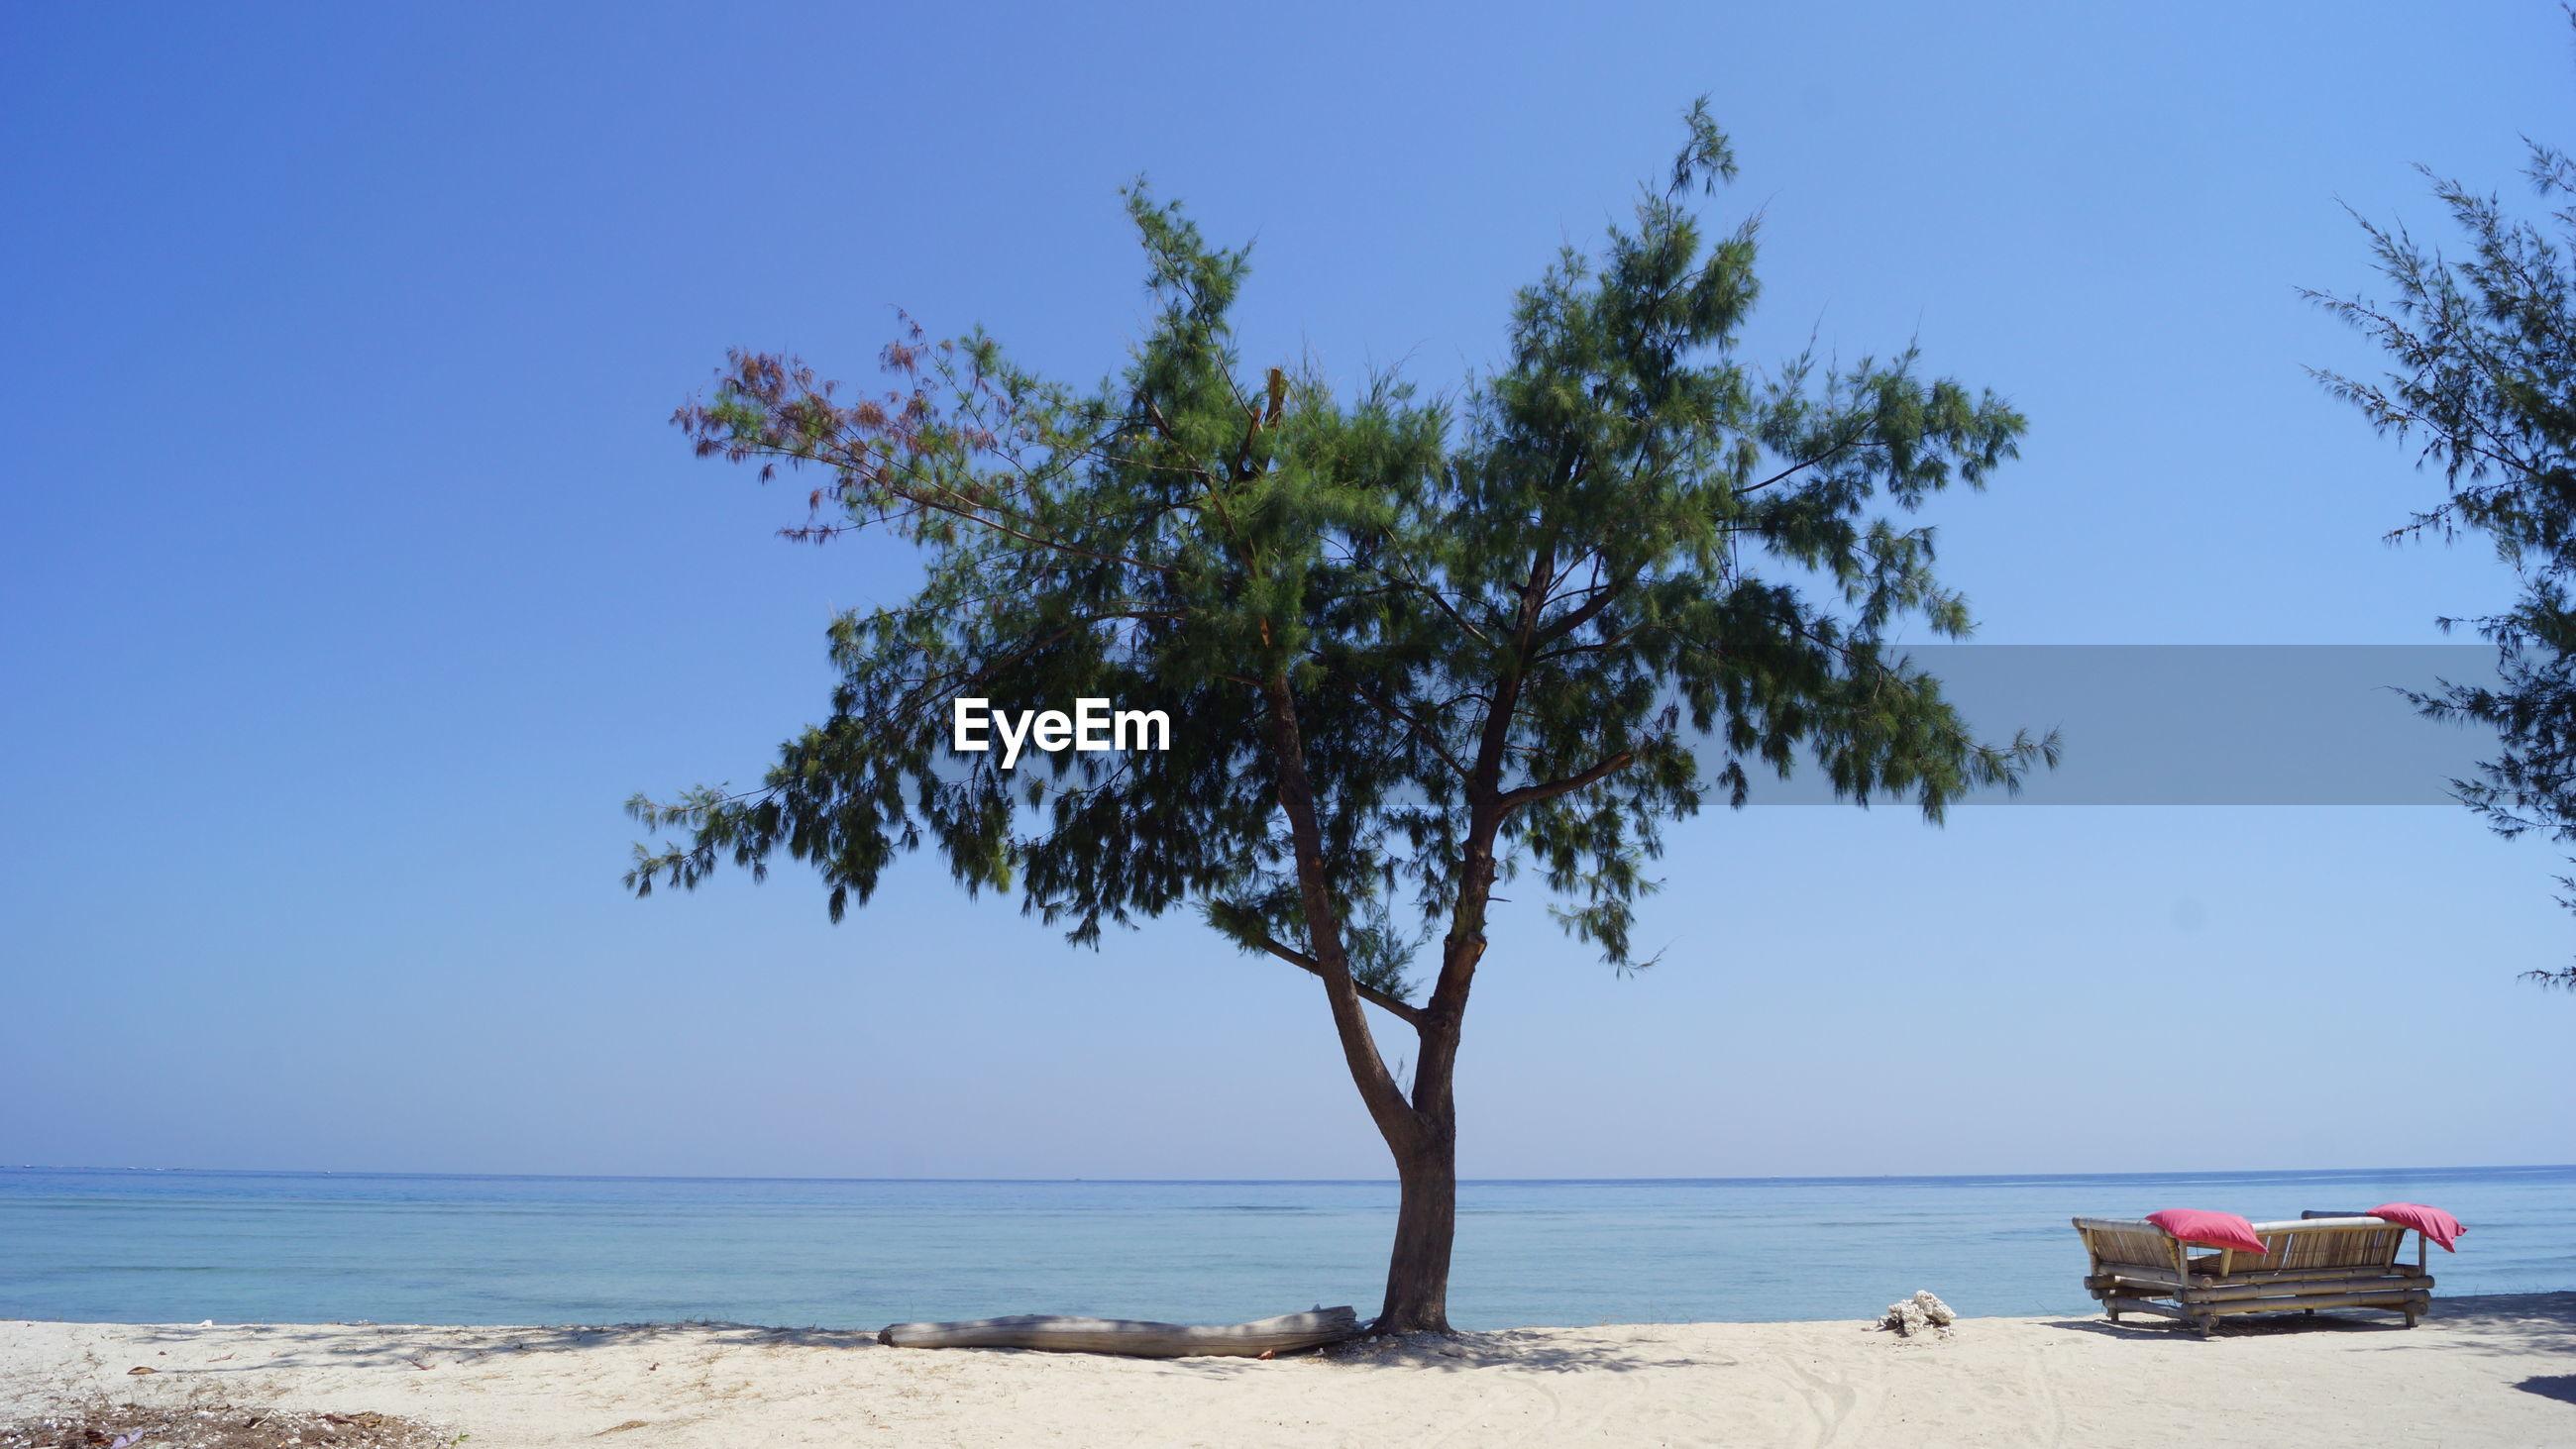 Tree at beach against clear sky on sunny day